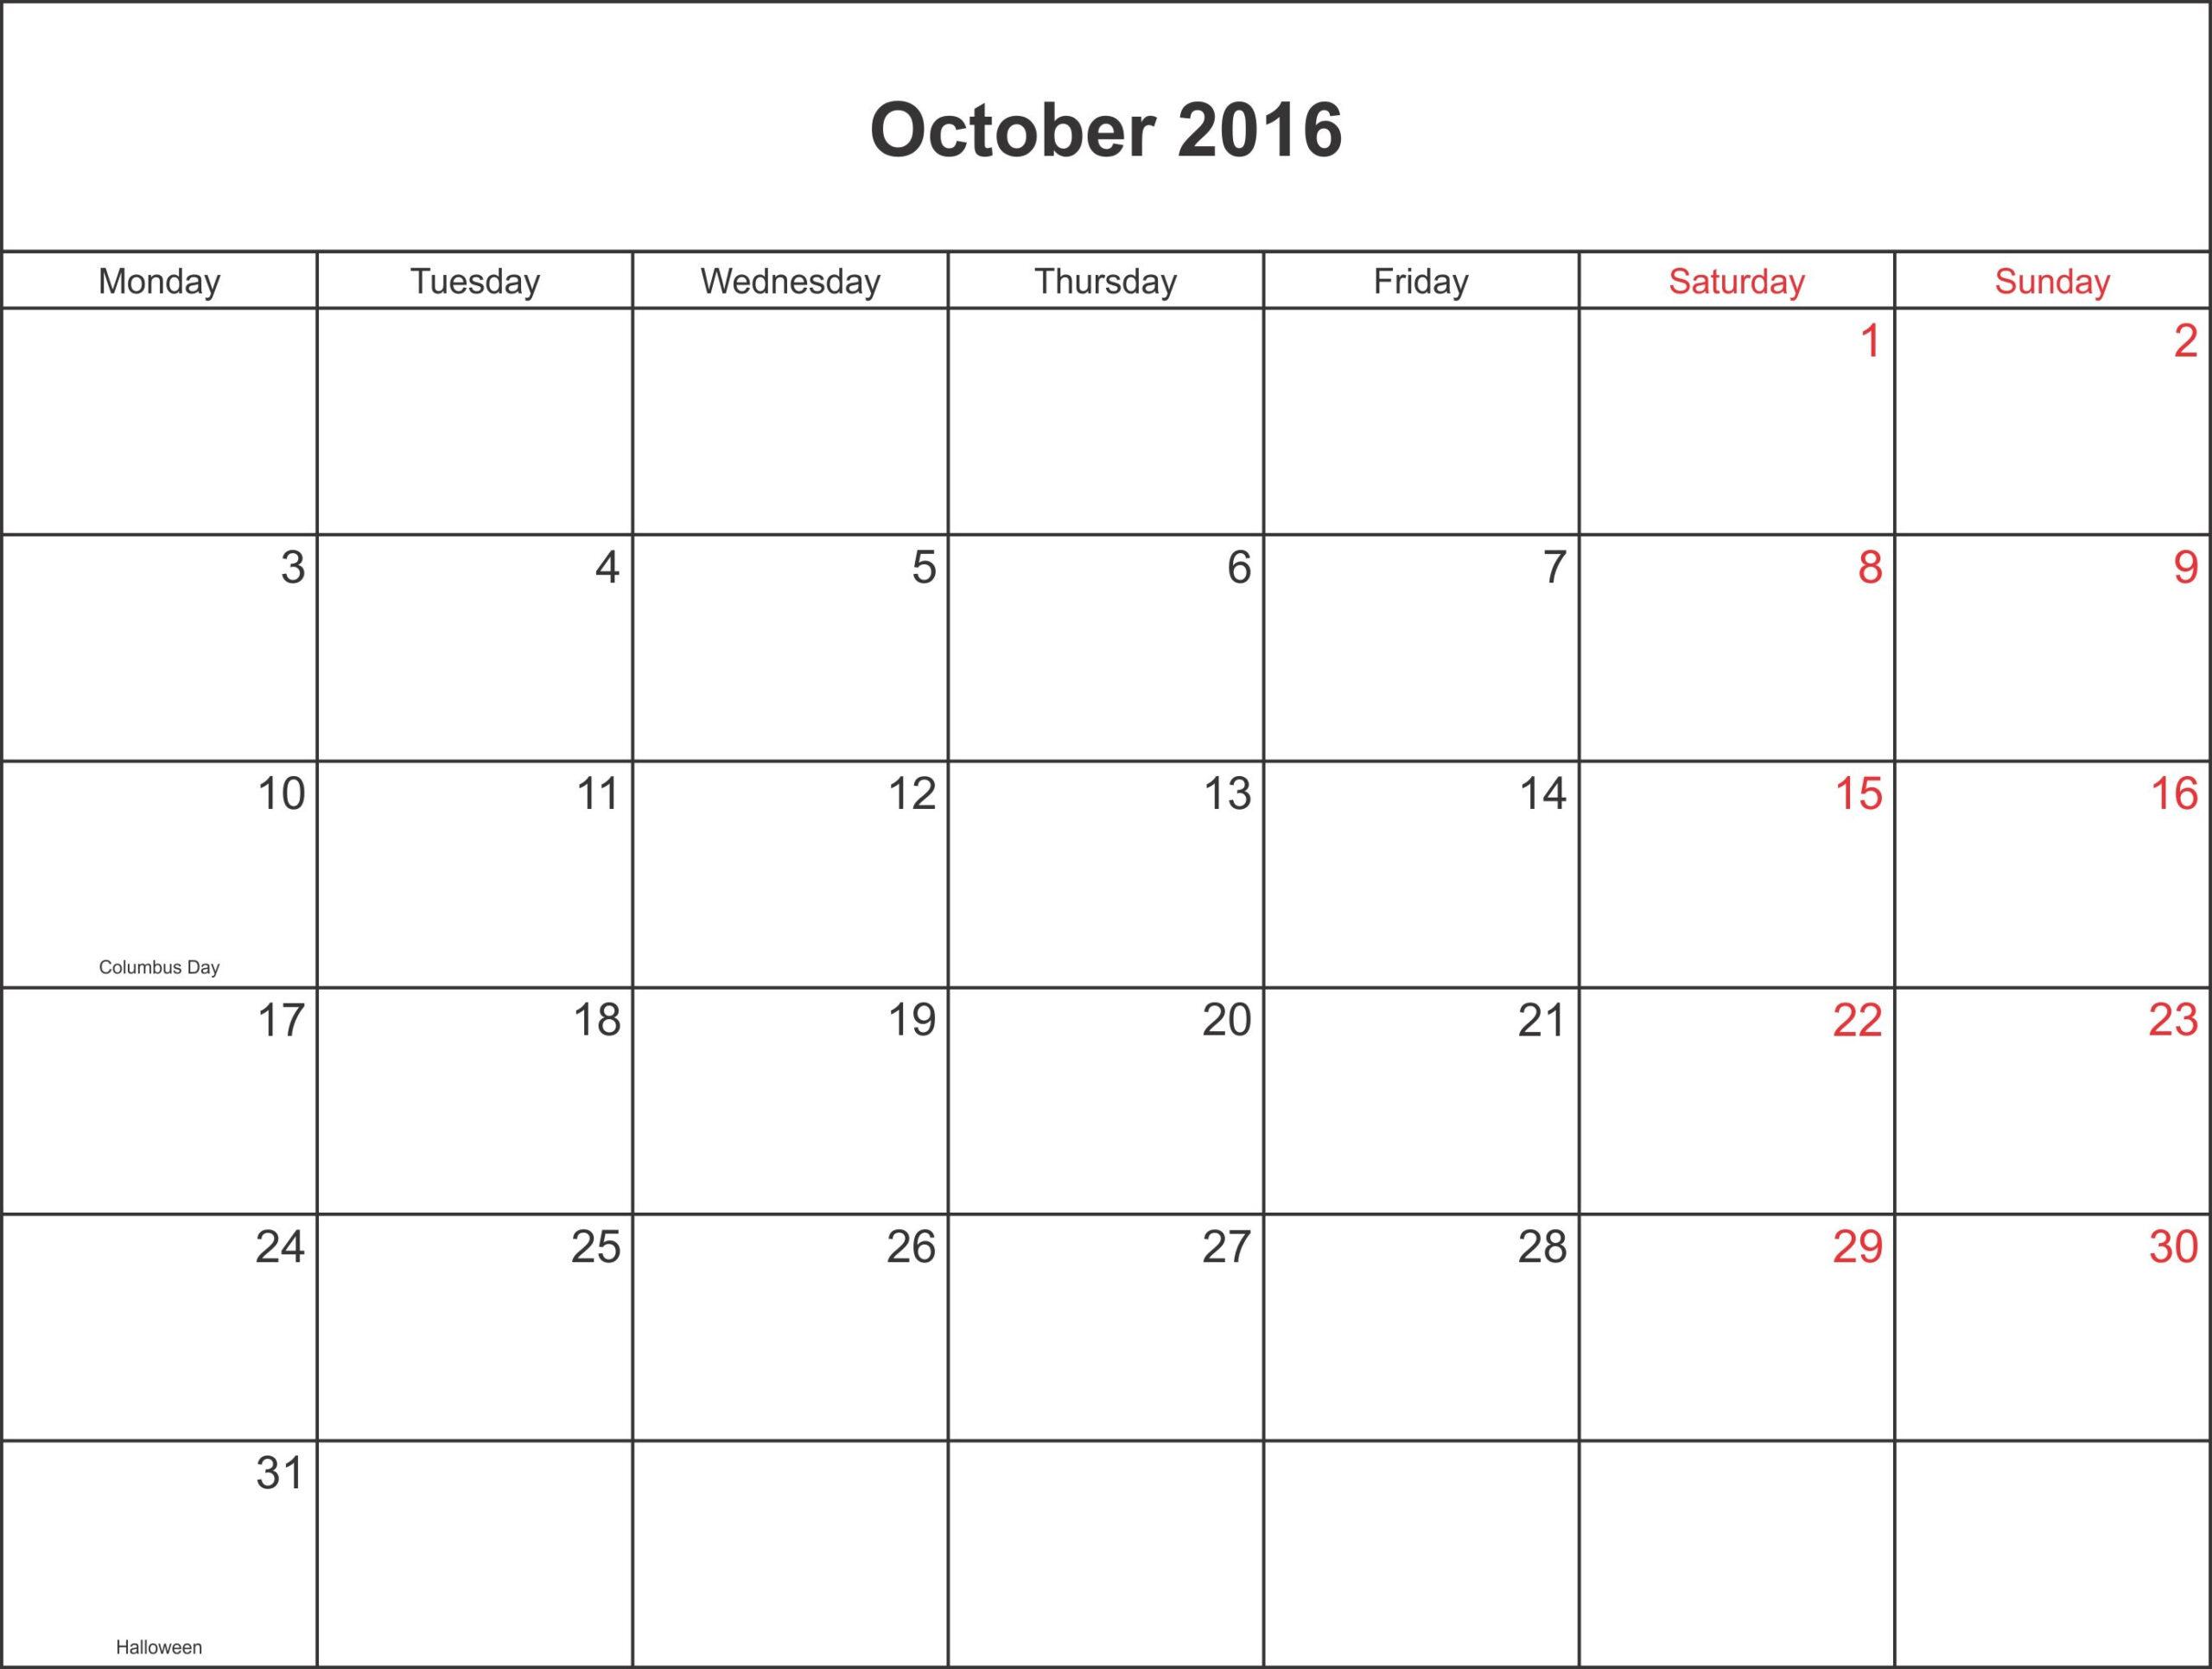 October 2016 Calendar Waterproof | August Calendar with Waterproof Calendar 2021